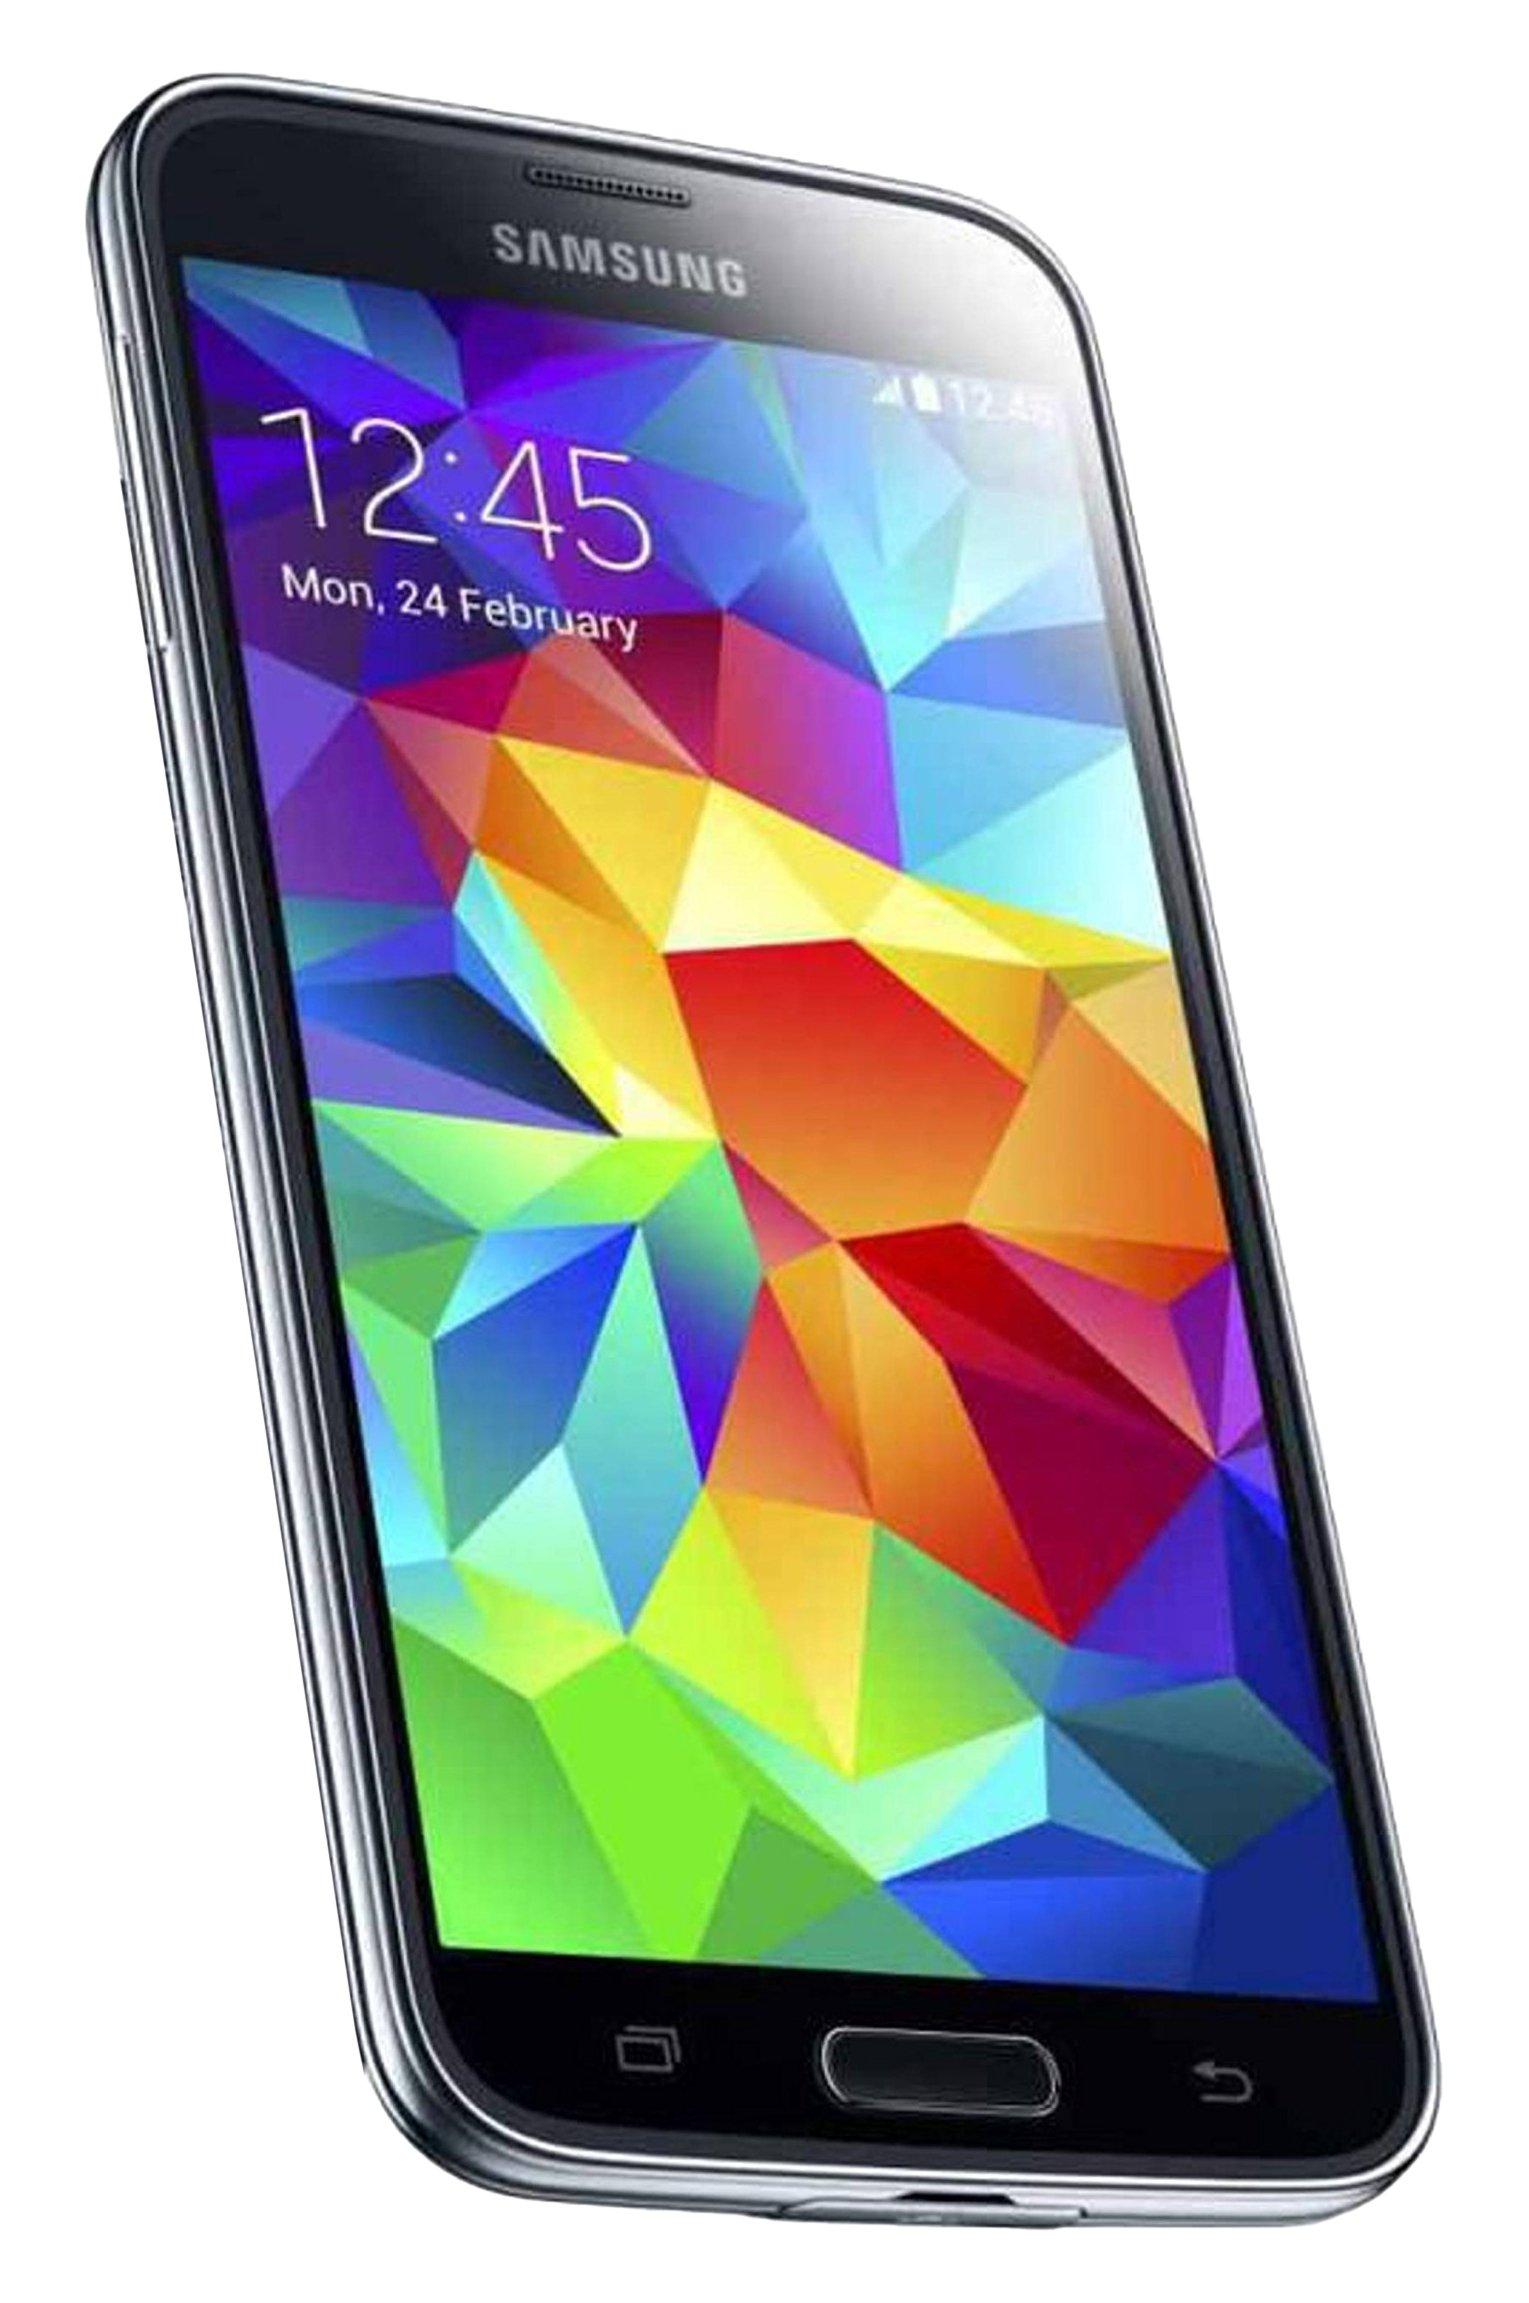 Samsung SM-G900V - Galaxy S5 - 16GB Android Smartphone Verizon  - Black (Certified Refurbished) by Samsung (Image #1)